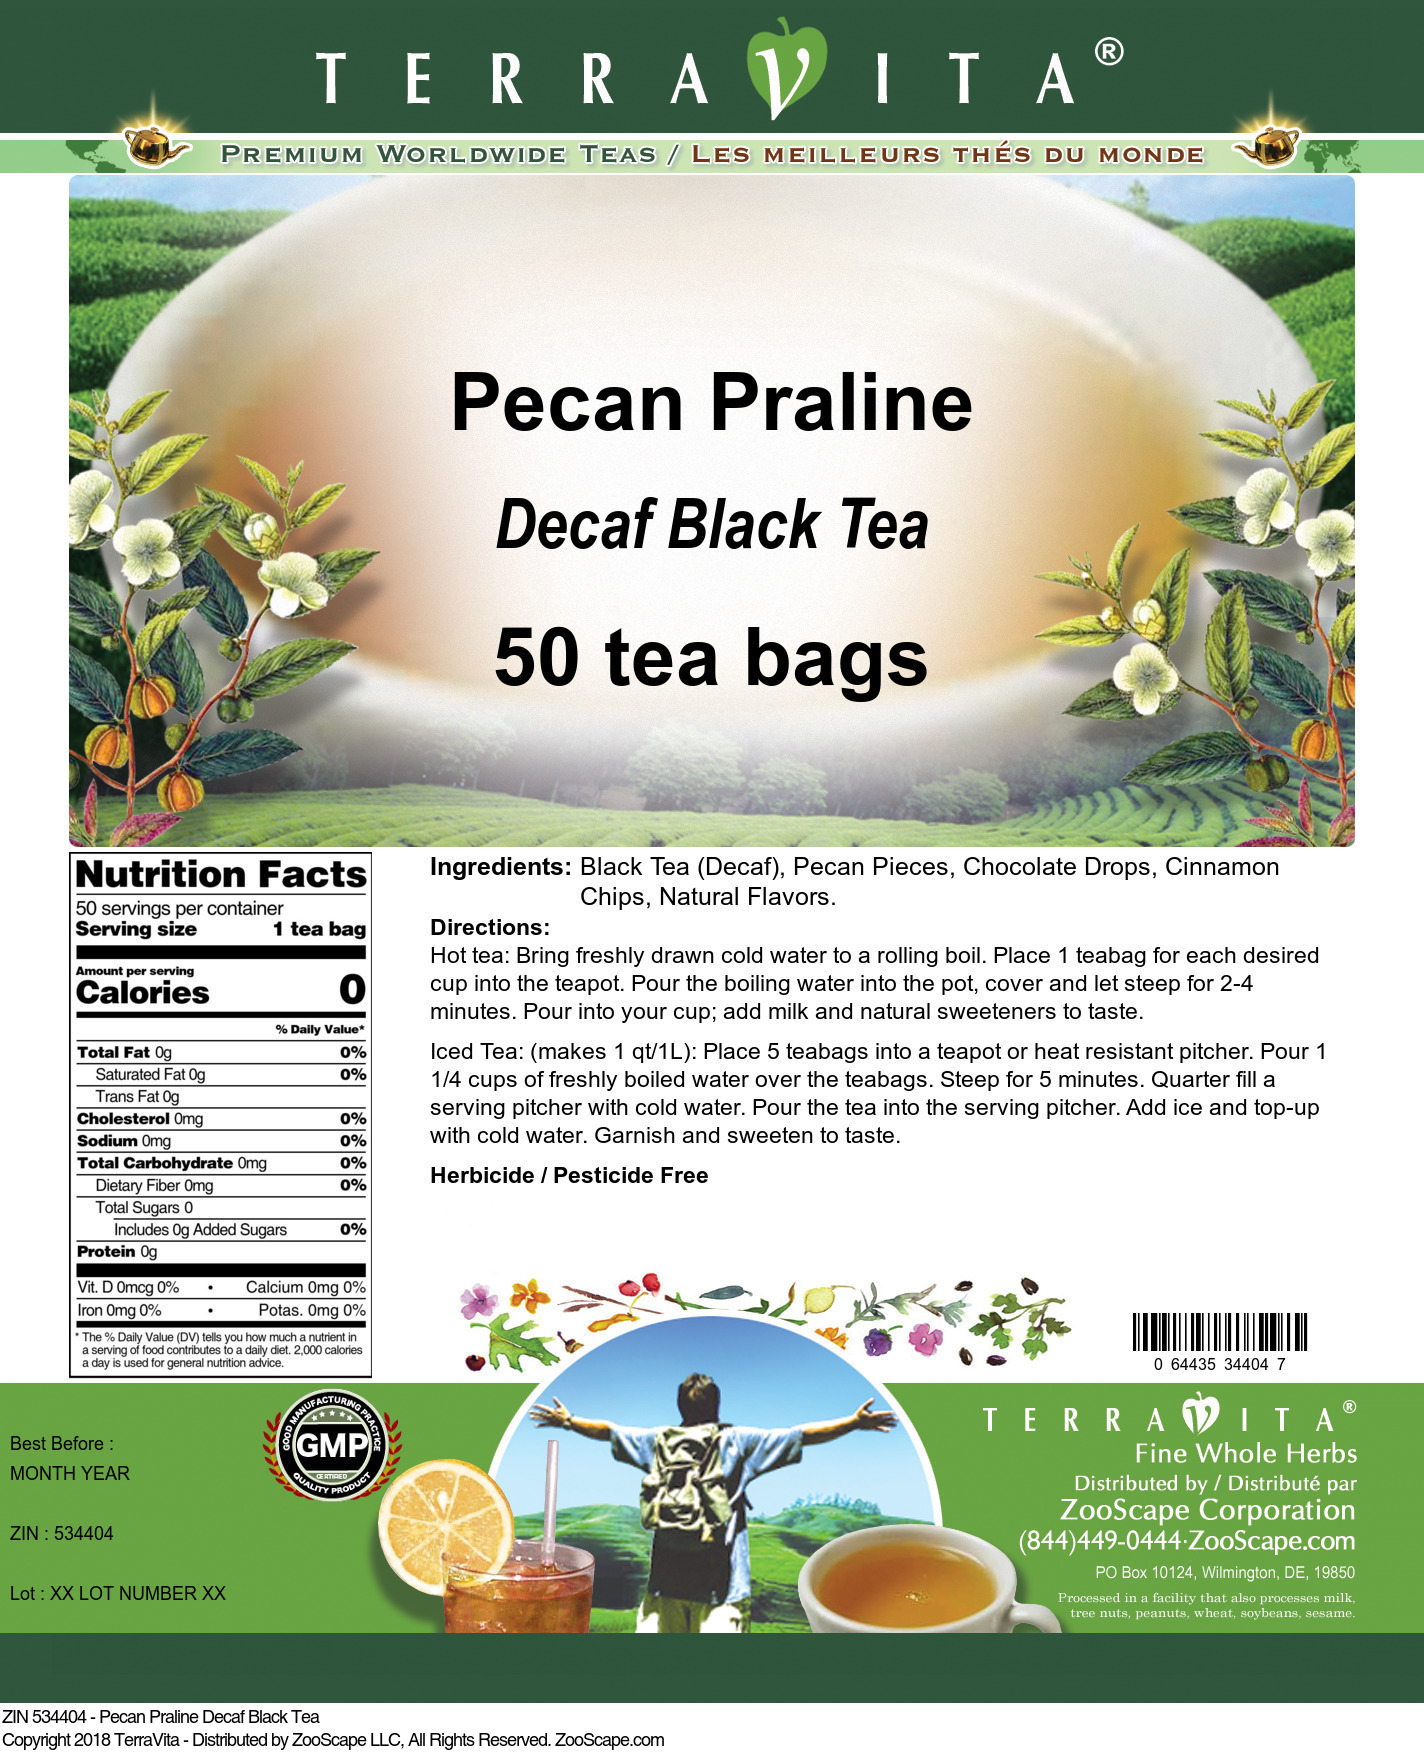 Pecan Praline Decaf Black Tea